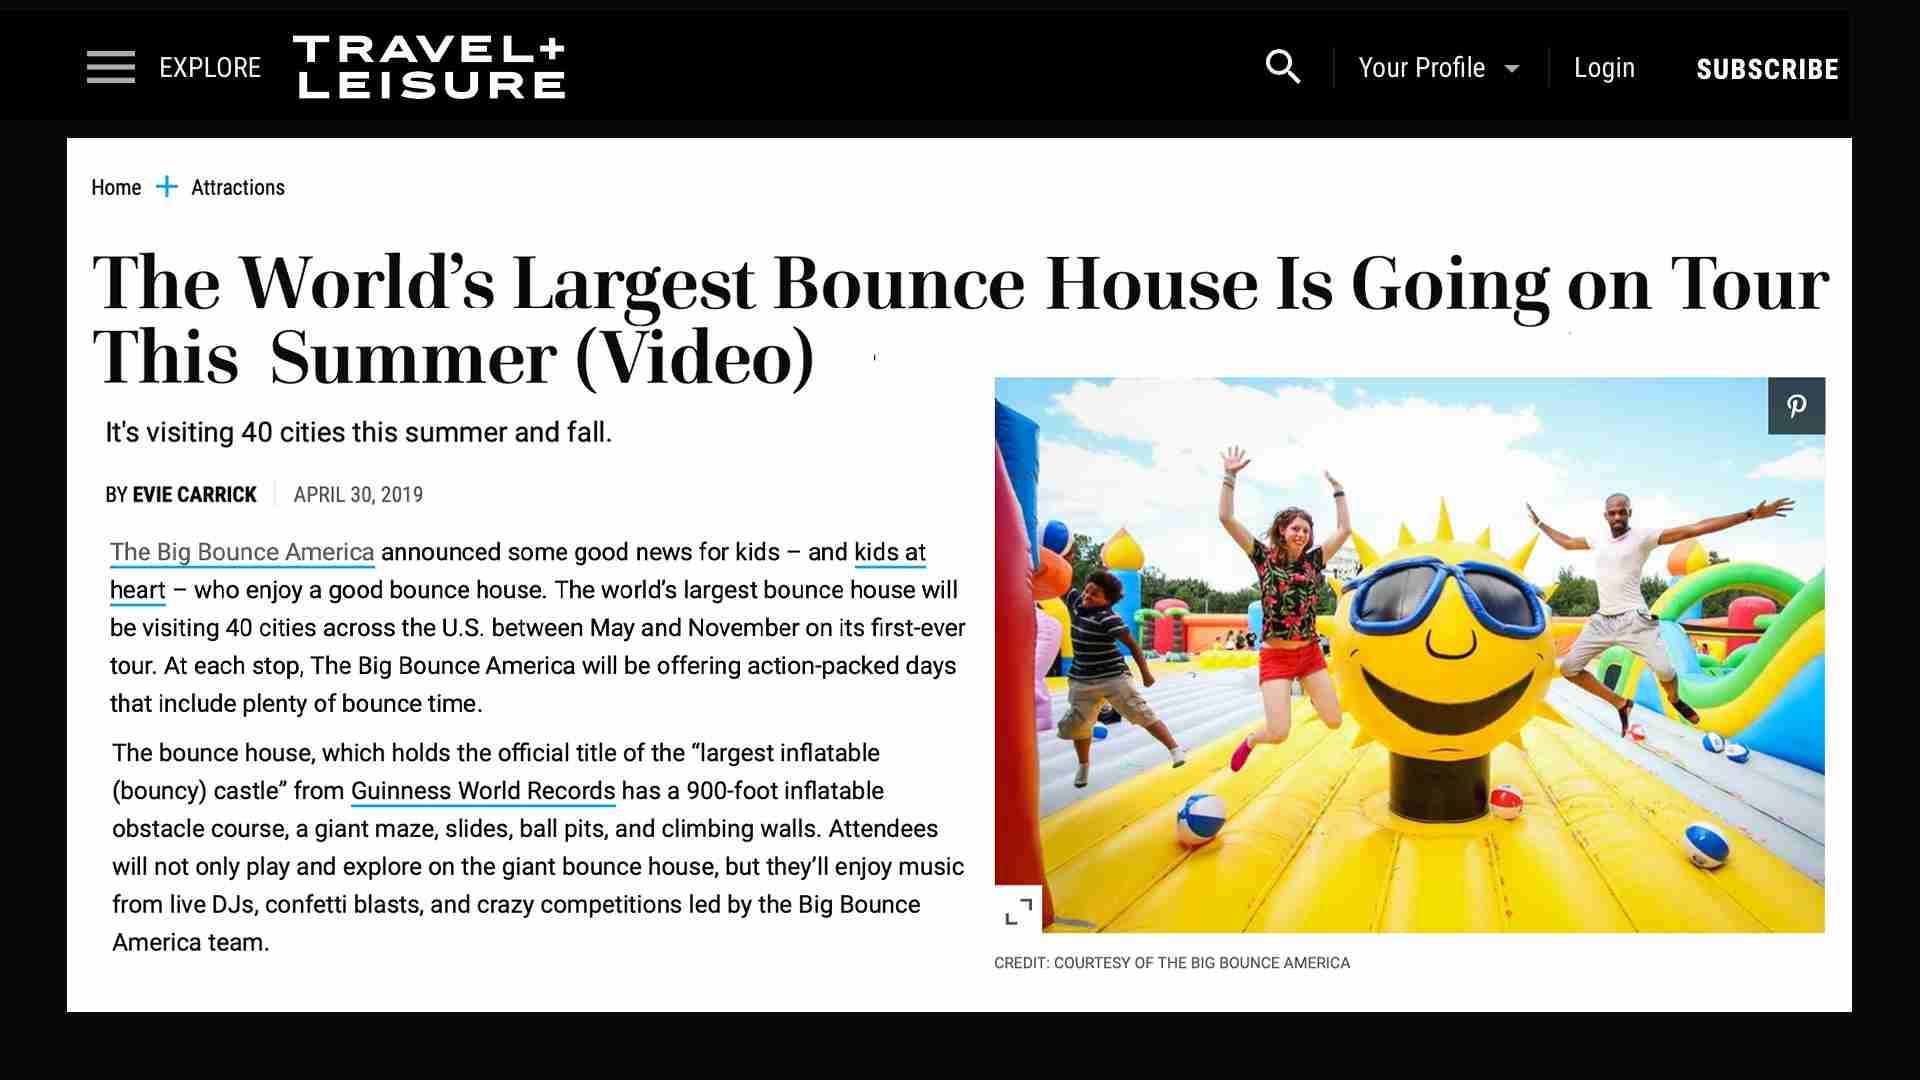 Text in Travel + Leisure magazine describing Big Bounce America